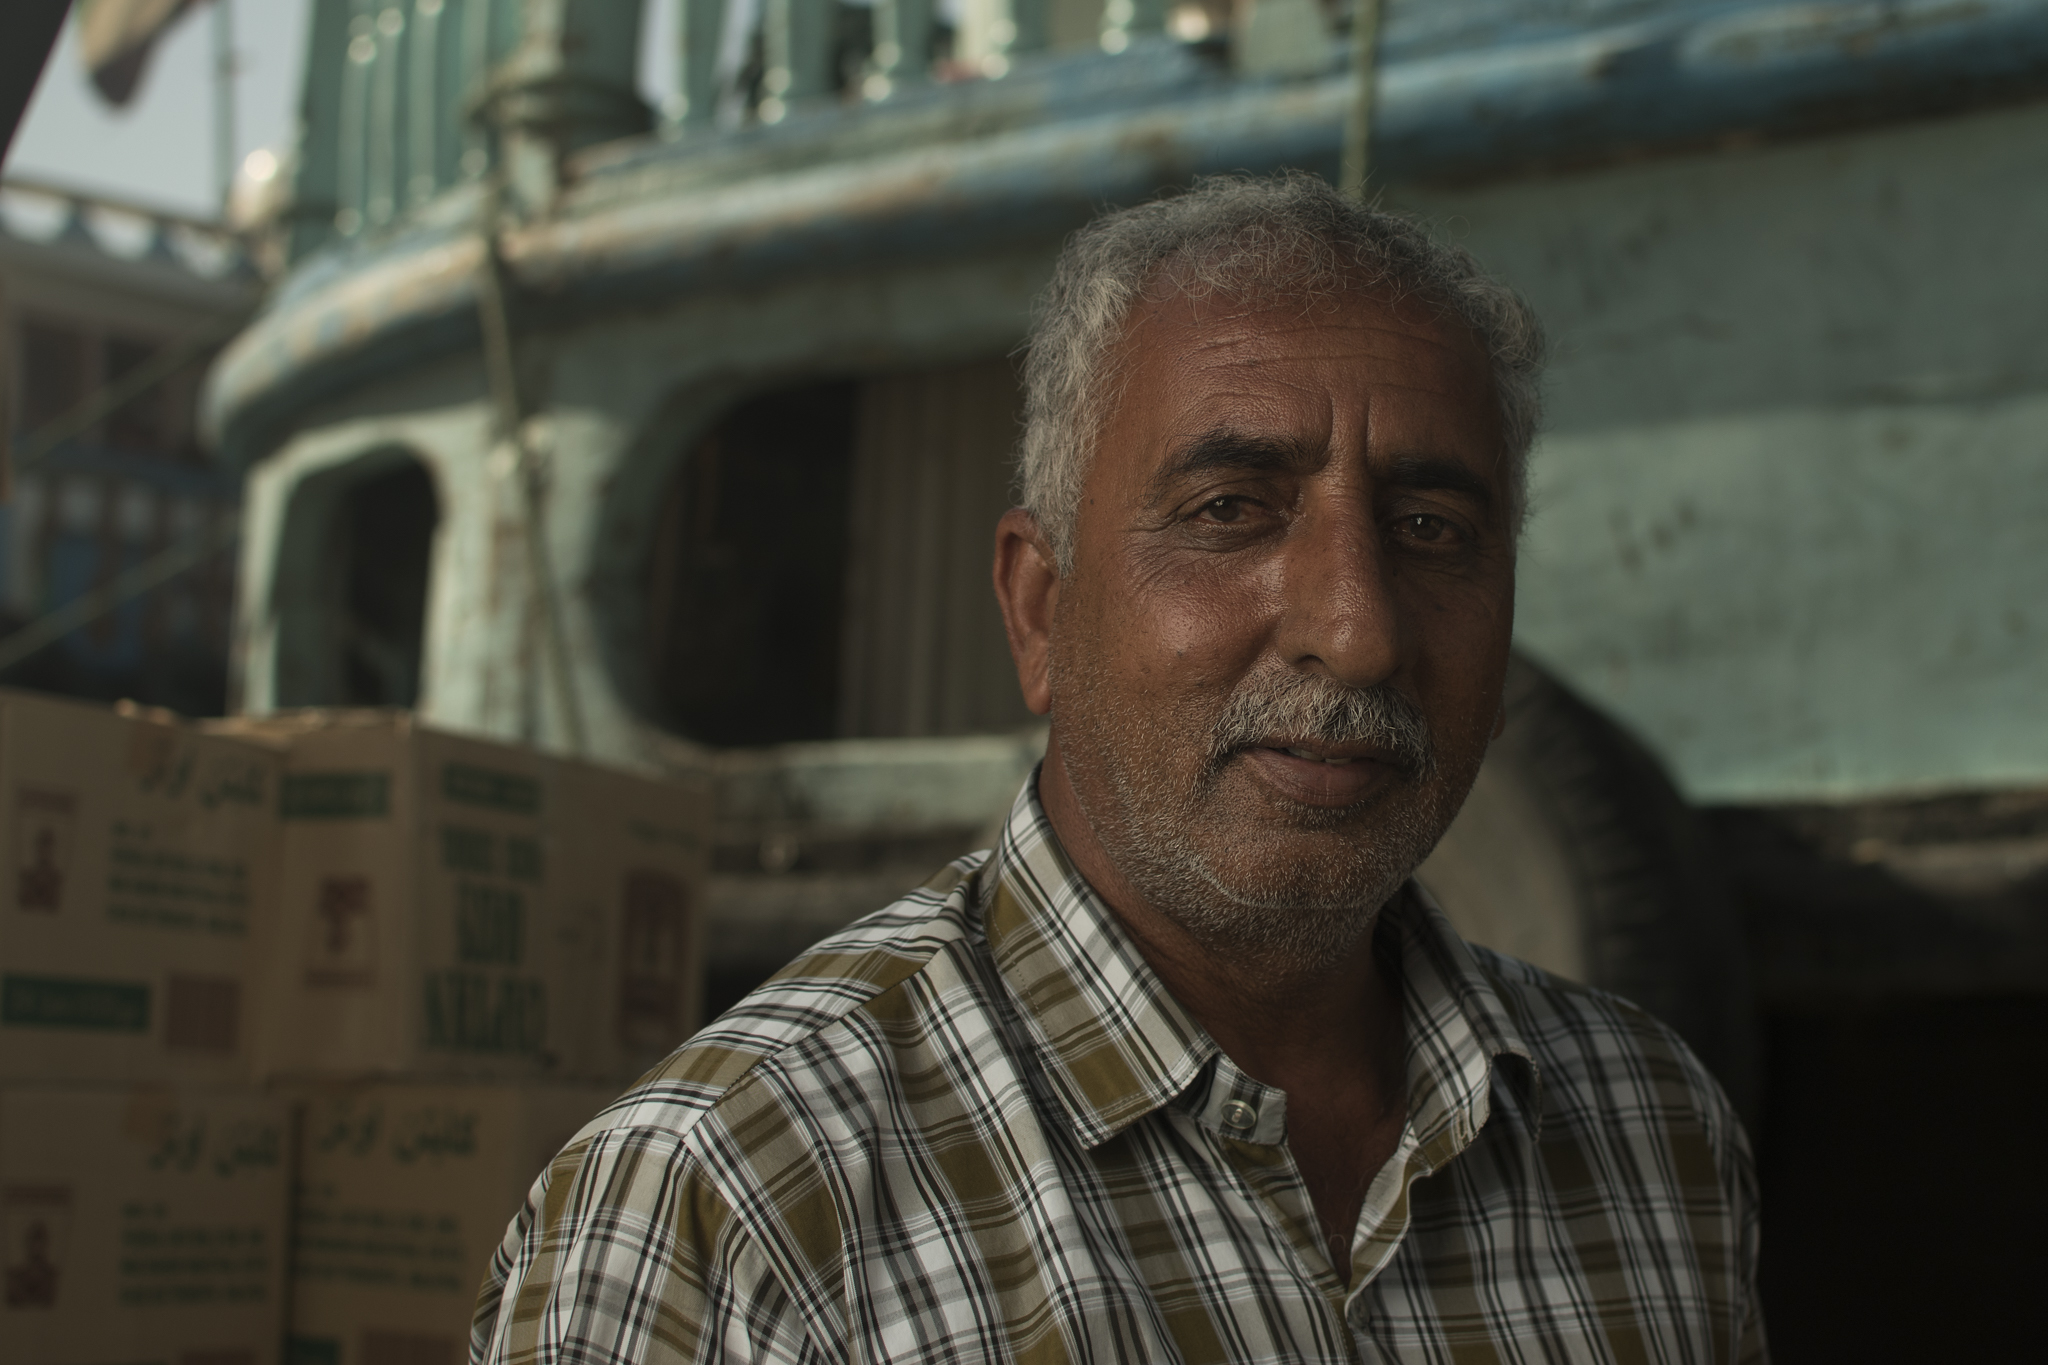 Dock worker, Deira Dubai